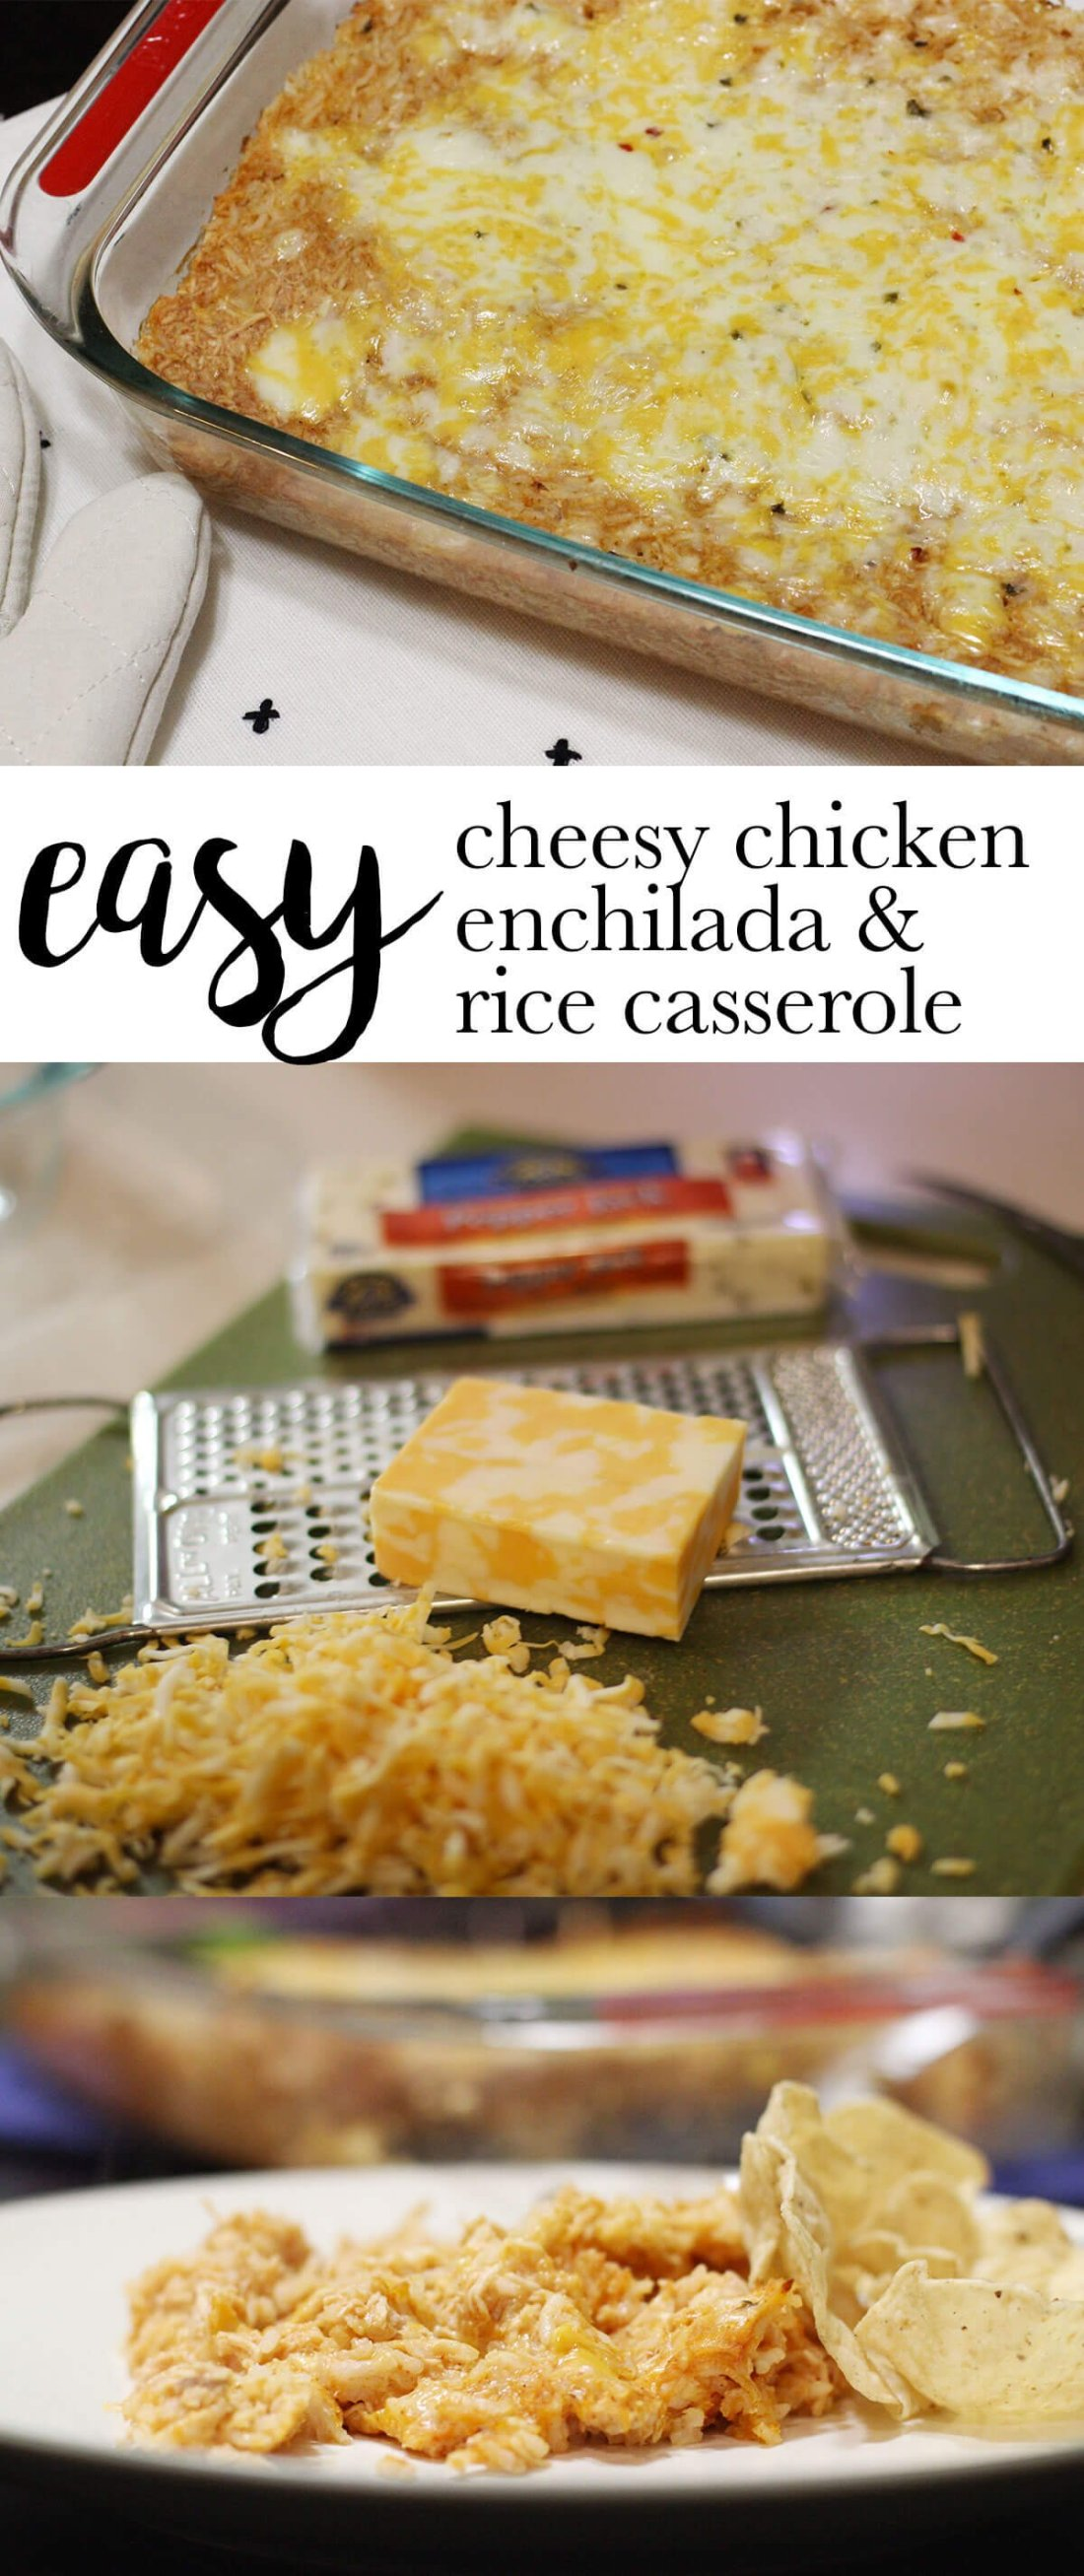 Easy Chessy Chicken Enchilada & Rice Casserole | Shopaholic & a Baby Blog